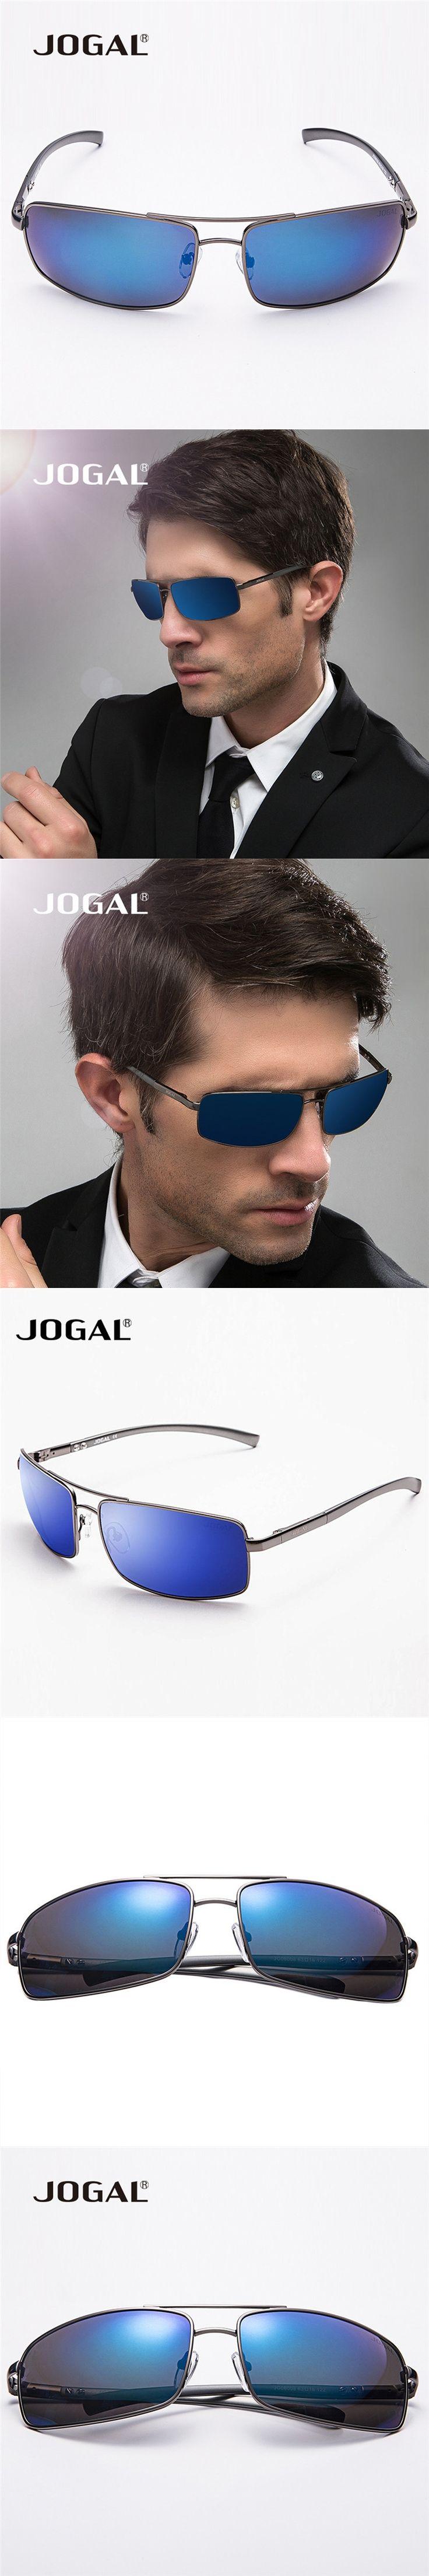 2017 Hot !!! Unisex Sunglasses set Mens Polarized Aviator Sunglasses Driving Glasses Eyewear Lens J 16